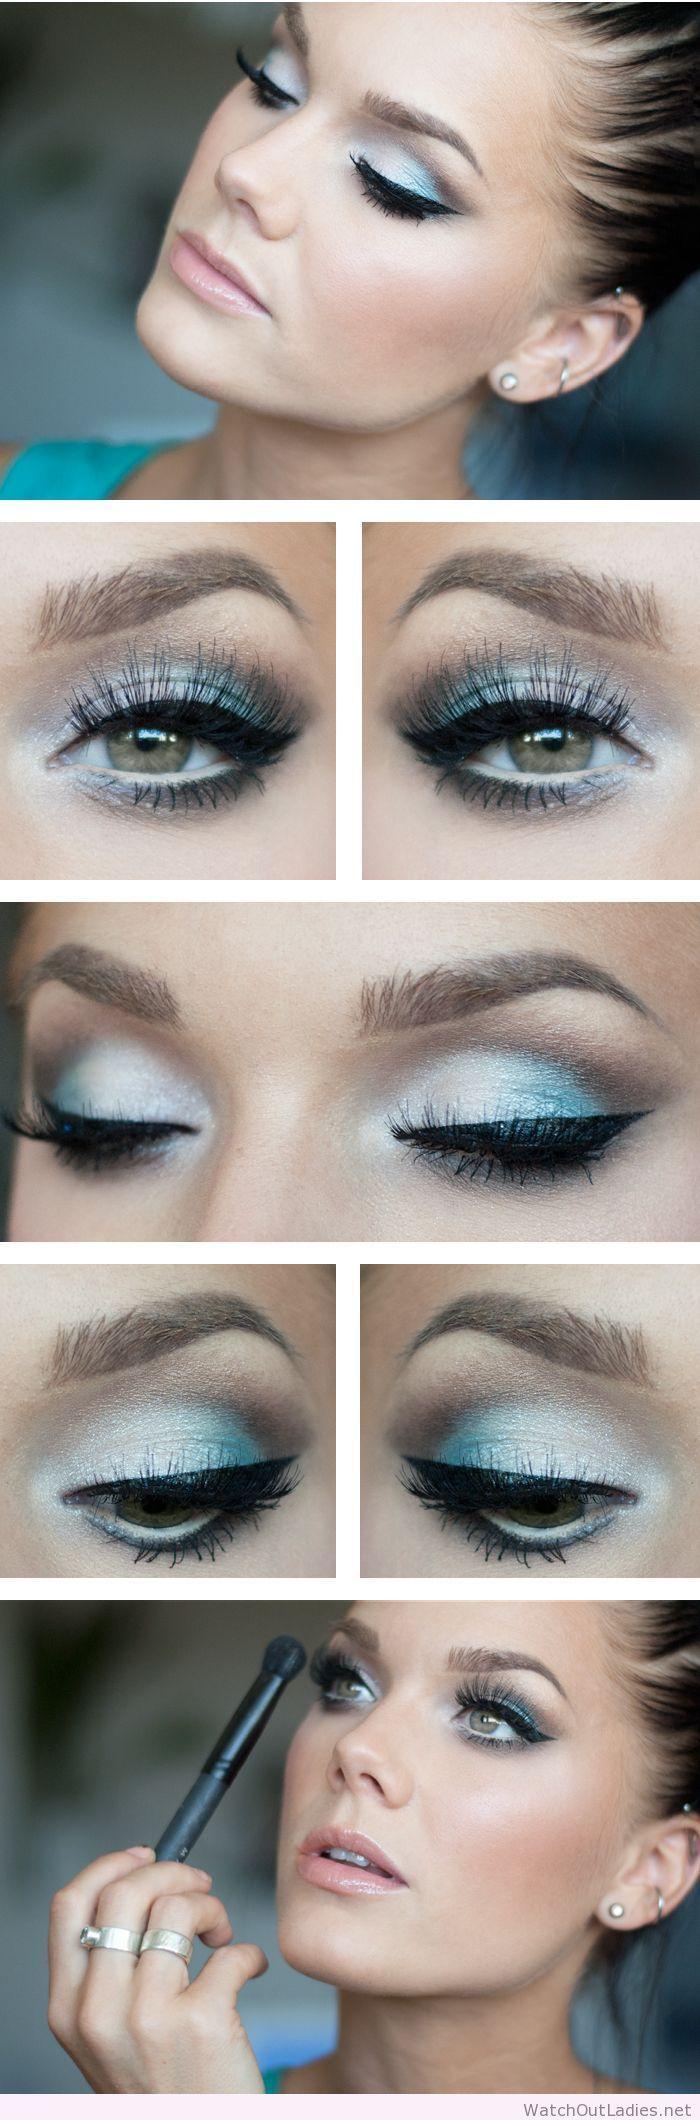 White dress eye makeup - White Dress Eye Makeup 10